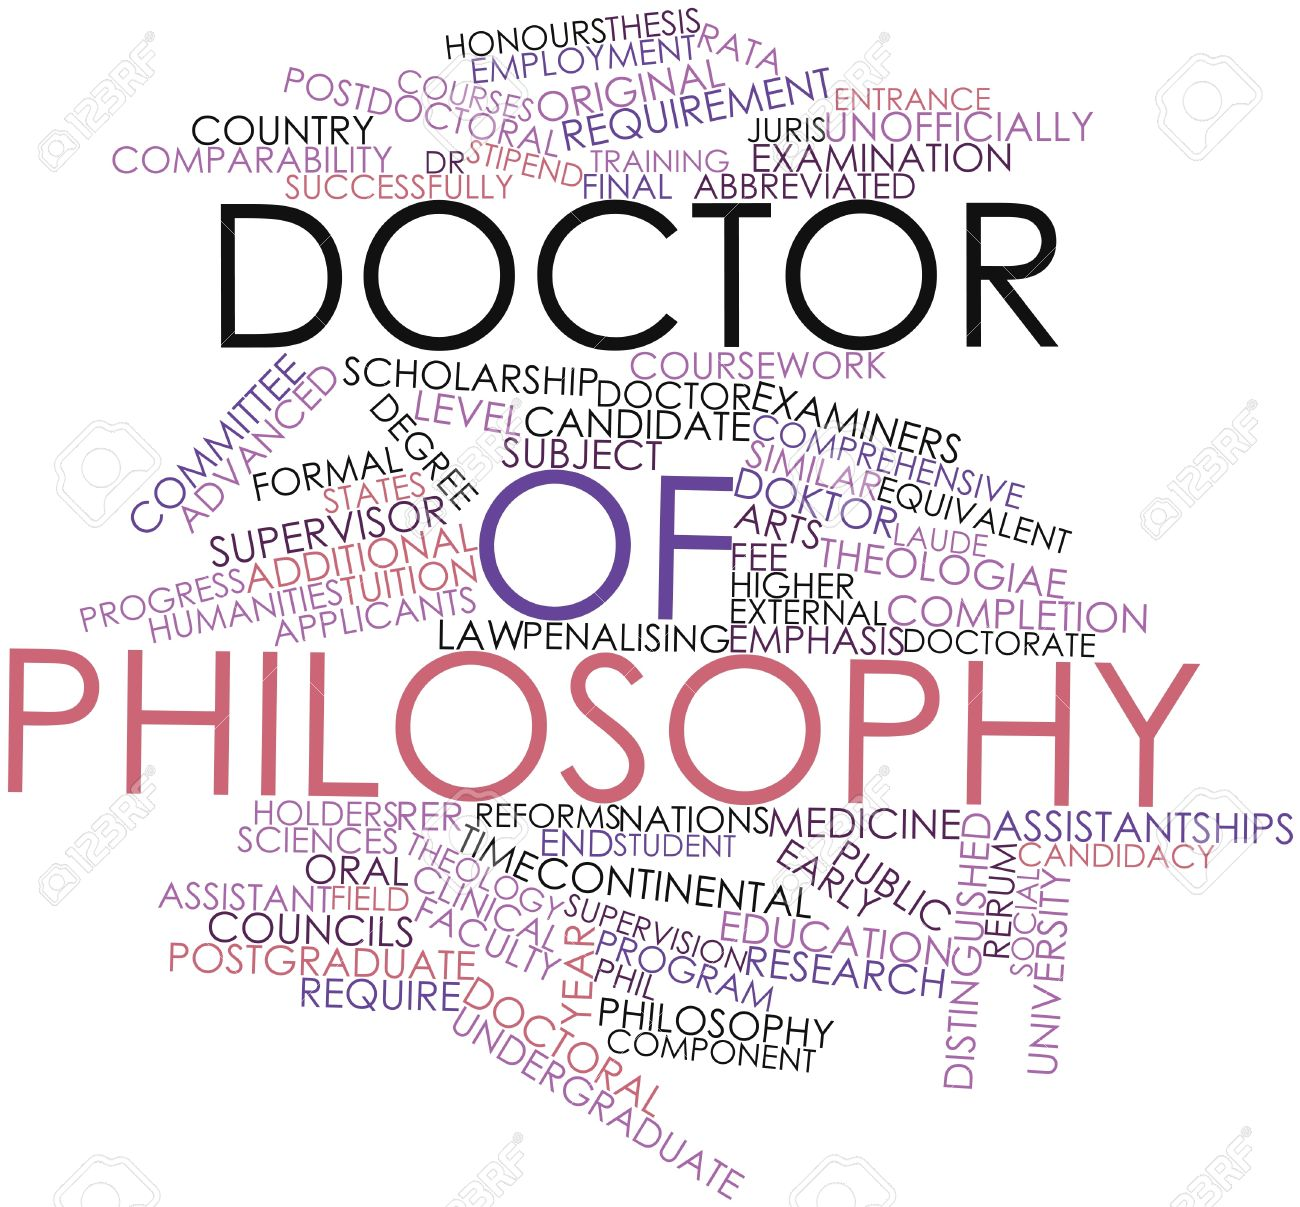 Philosophy doctorate